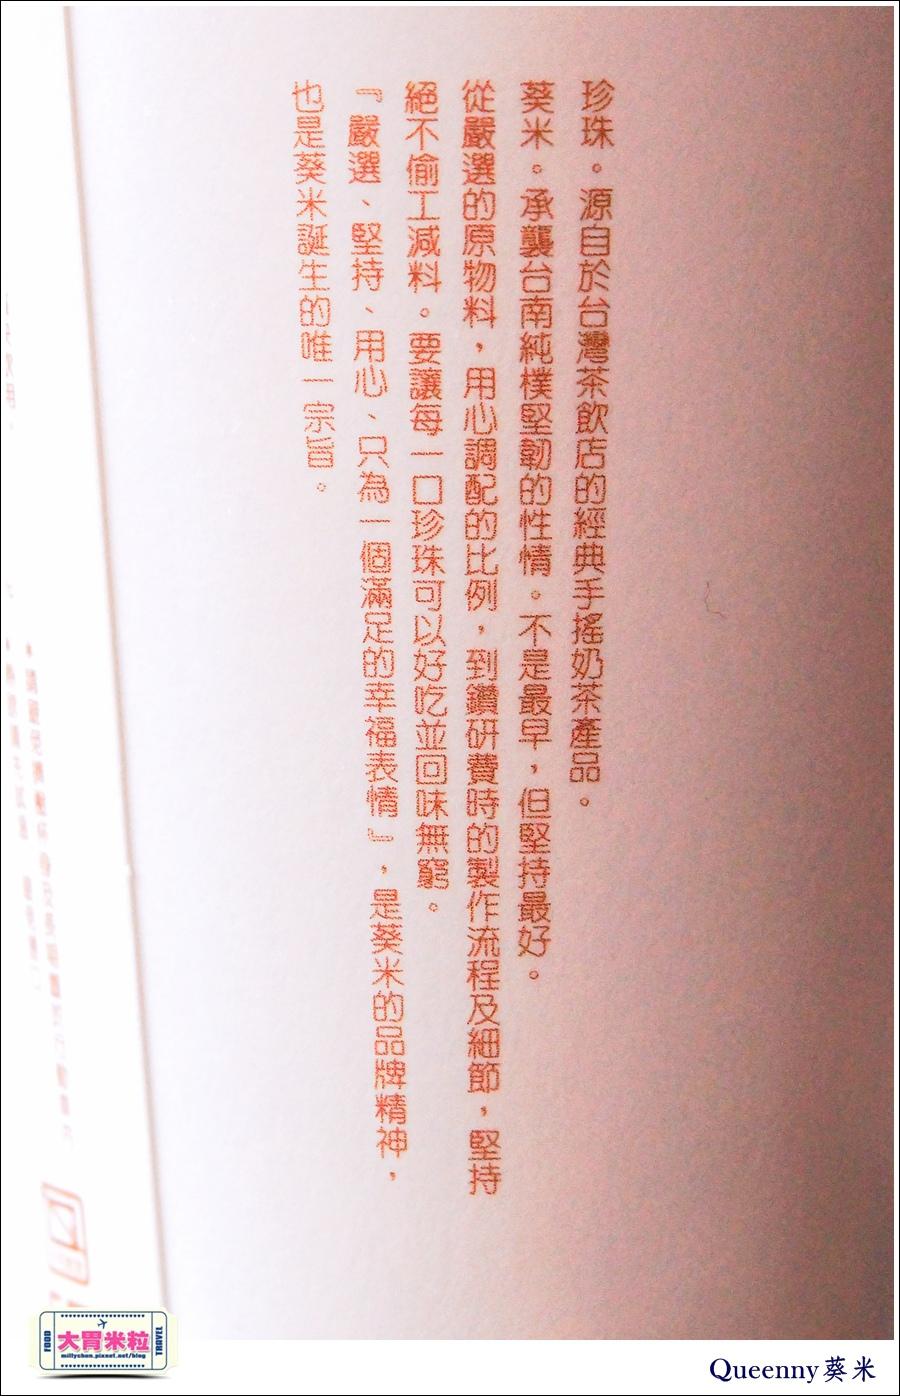 QUEENNY葵米高雄珍珠飲品推薦@大胃米粒0052.jpg